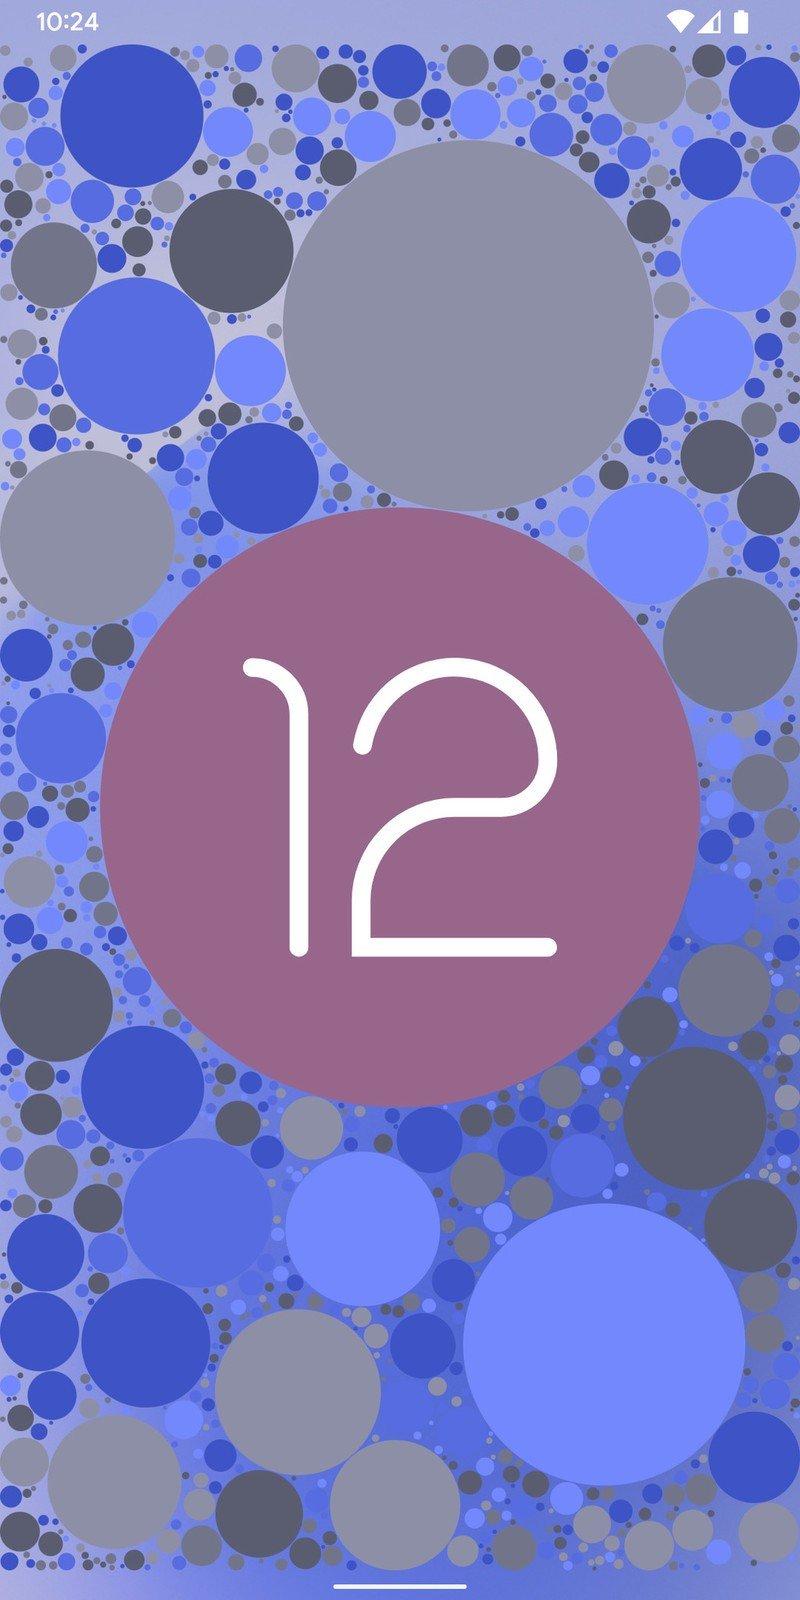 android-12-easter-egg-ss05.jpg